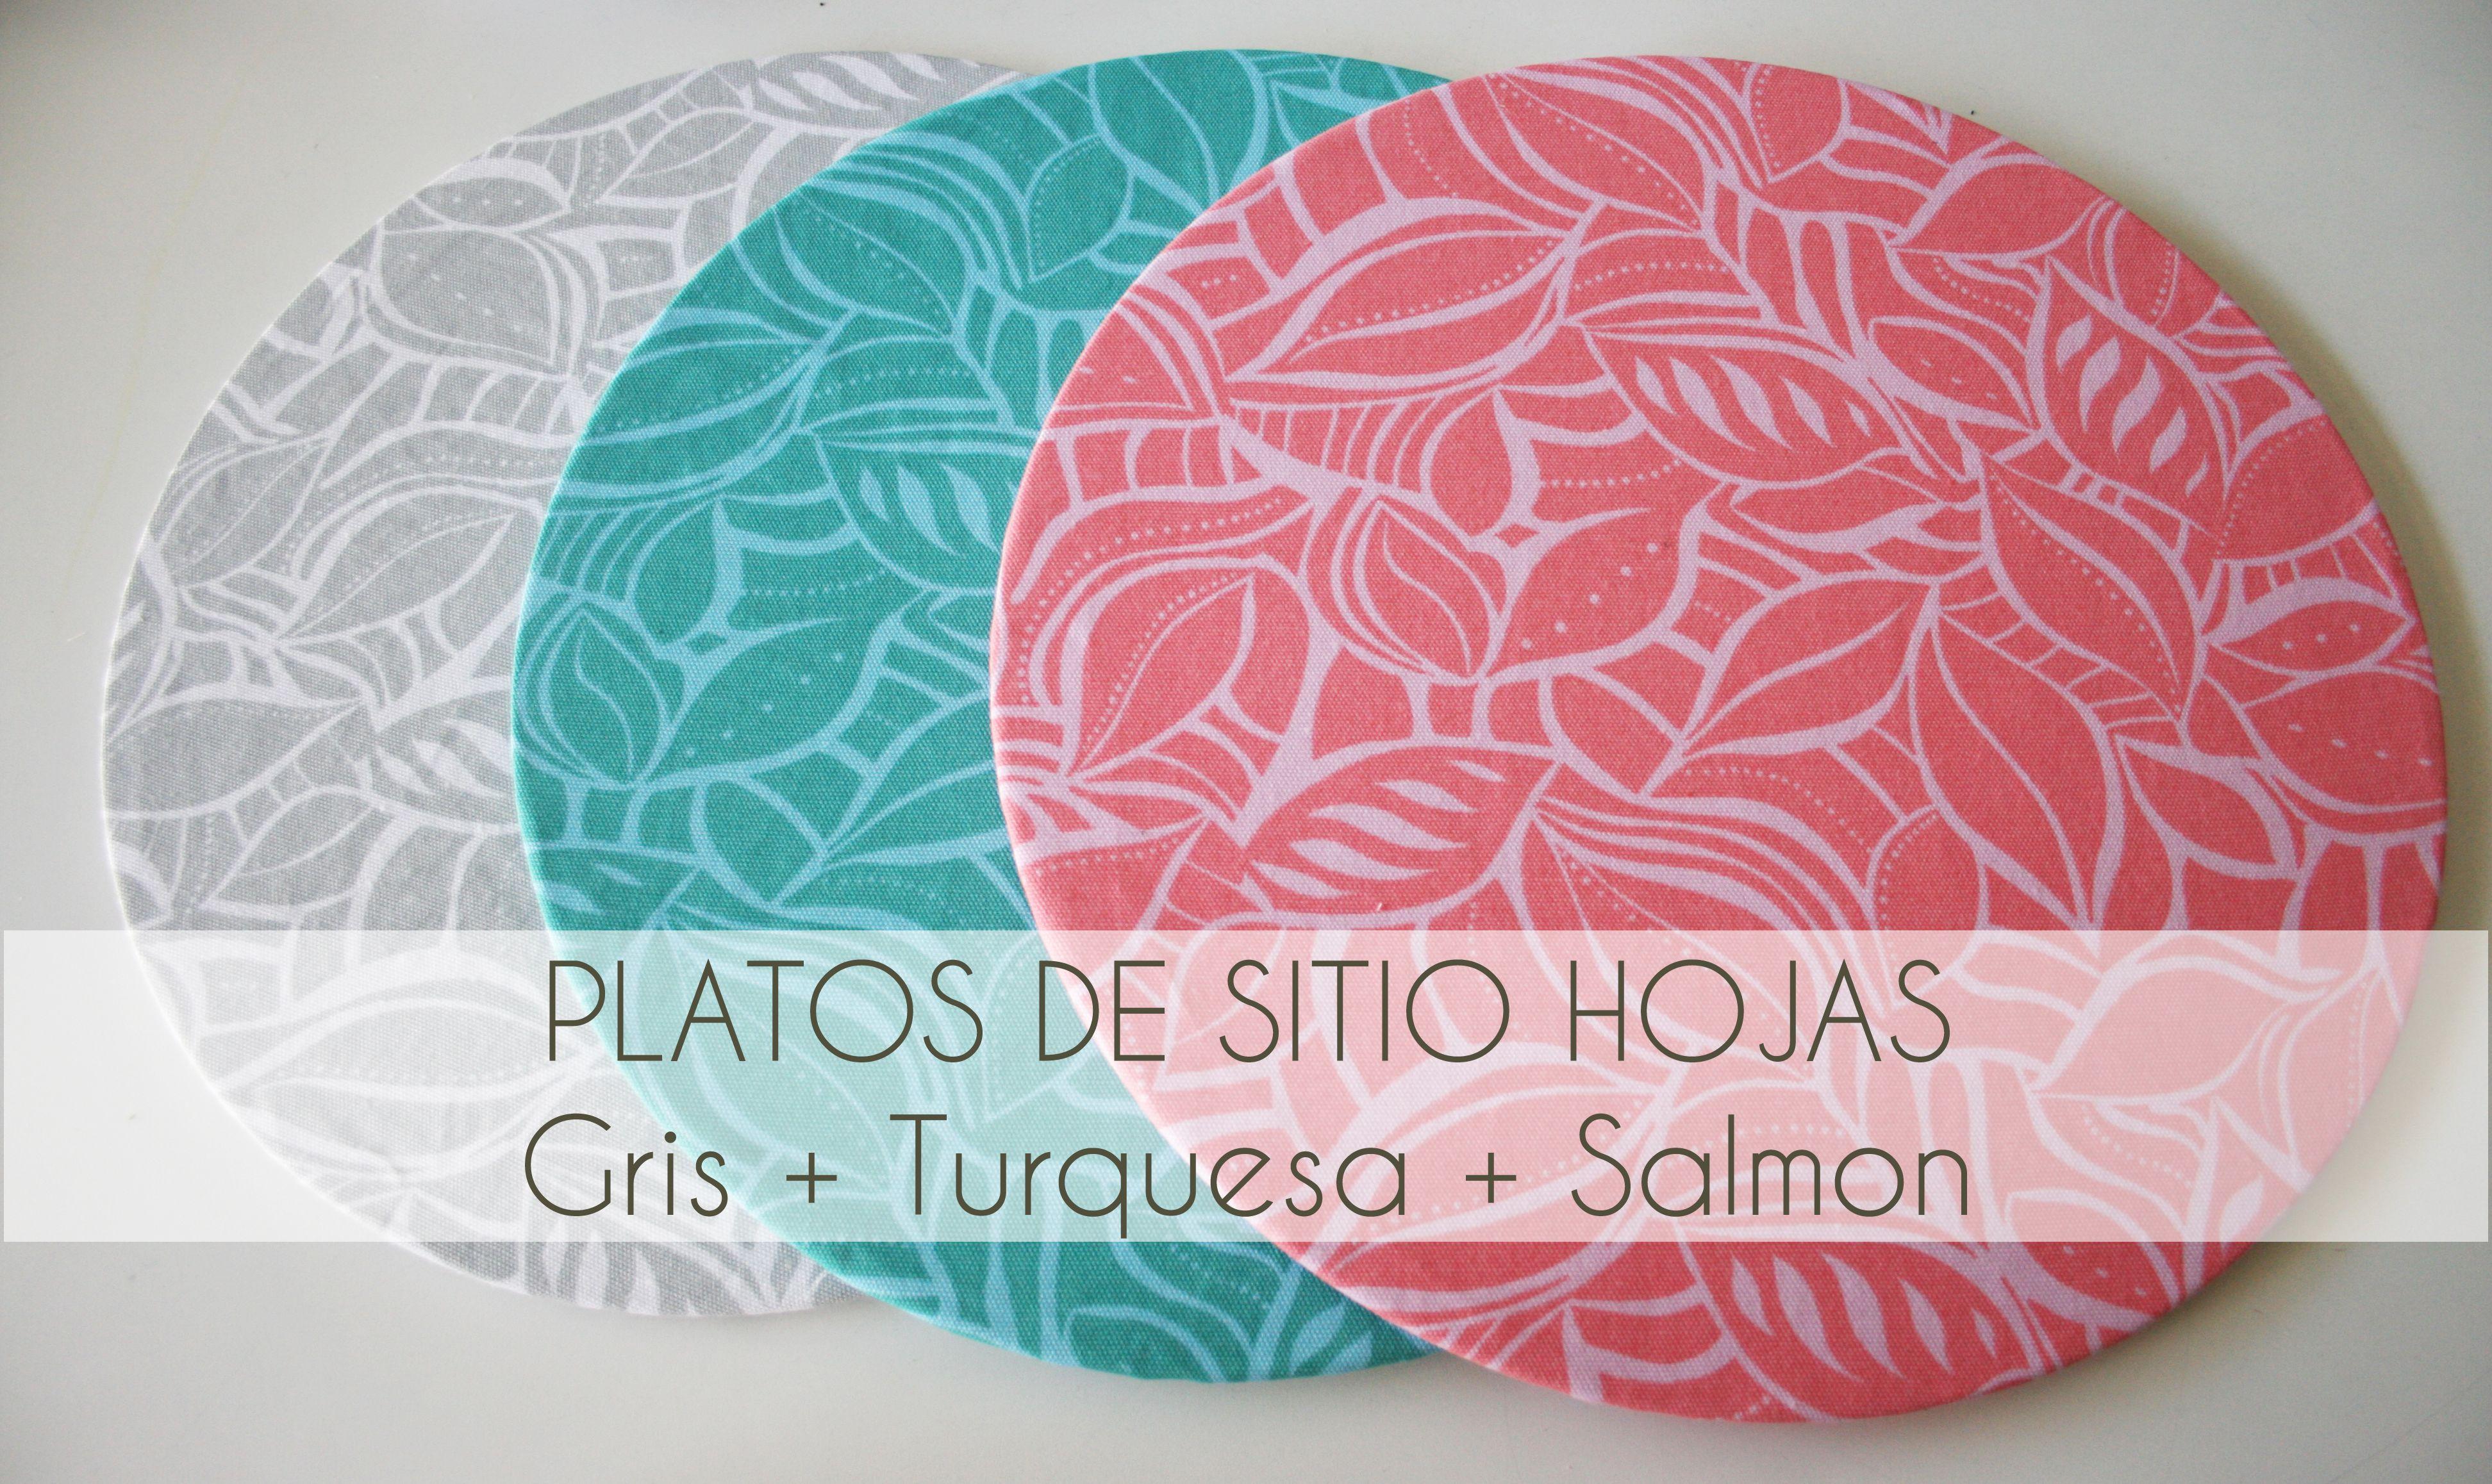 Trío Hojas. Gris+turquesa+salmón